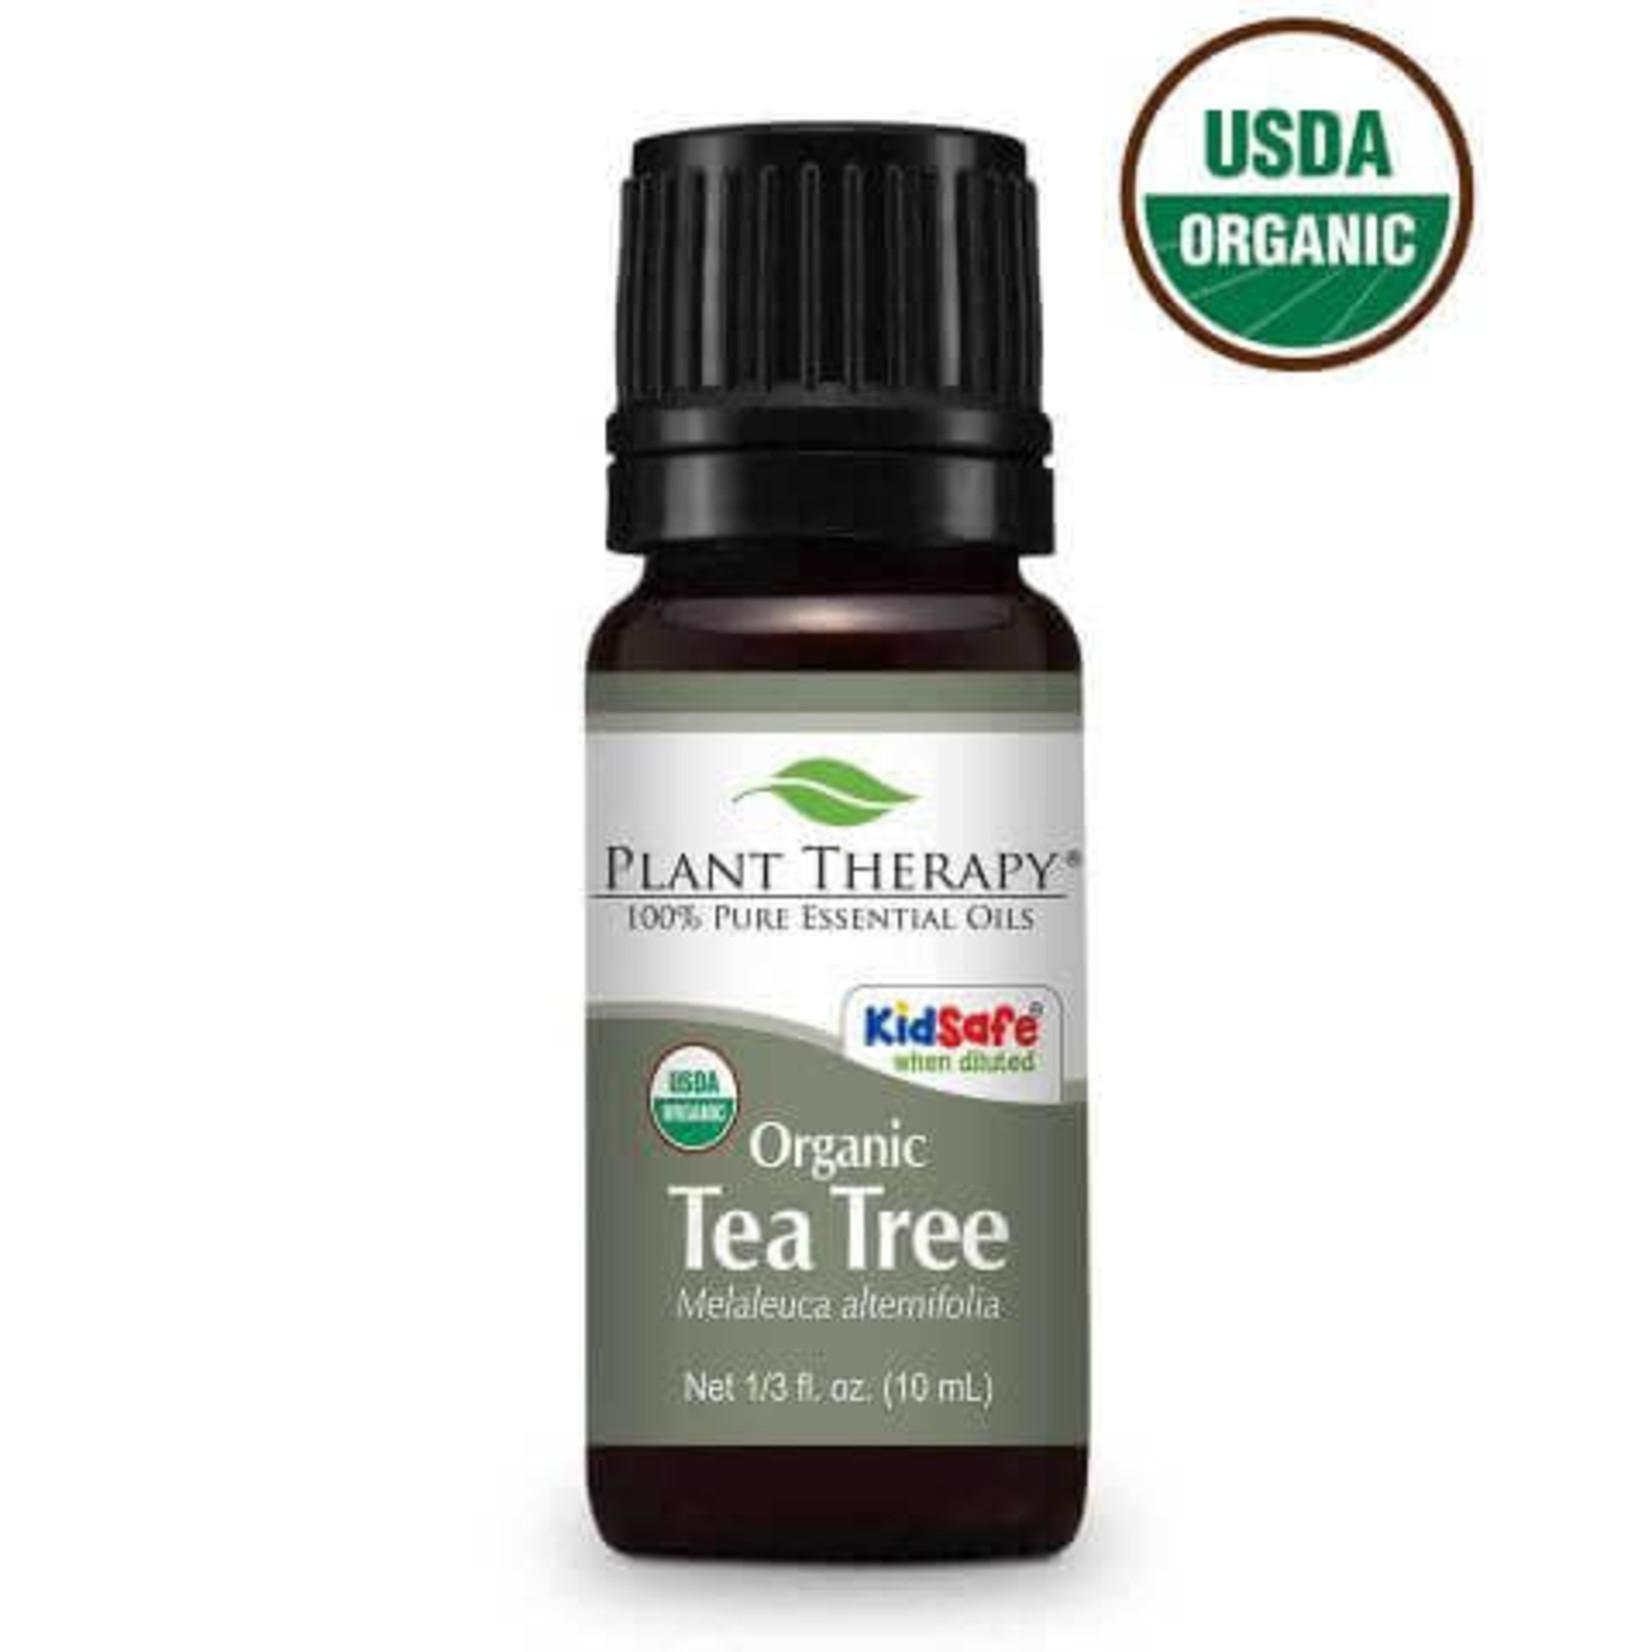 Plant Therapy PT Tea Tree Organic Essential Oil 10ml